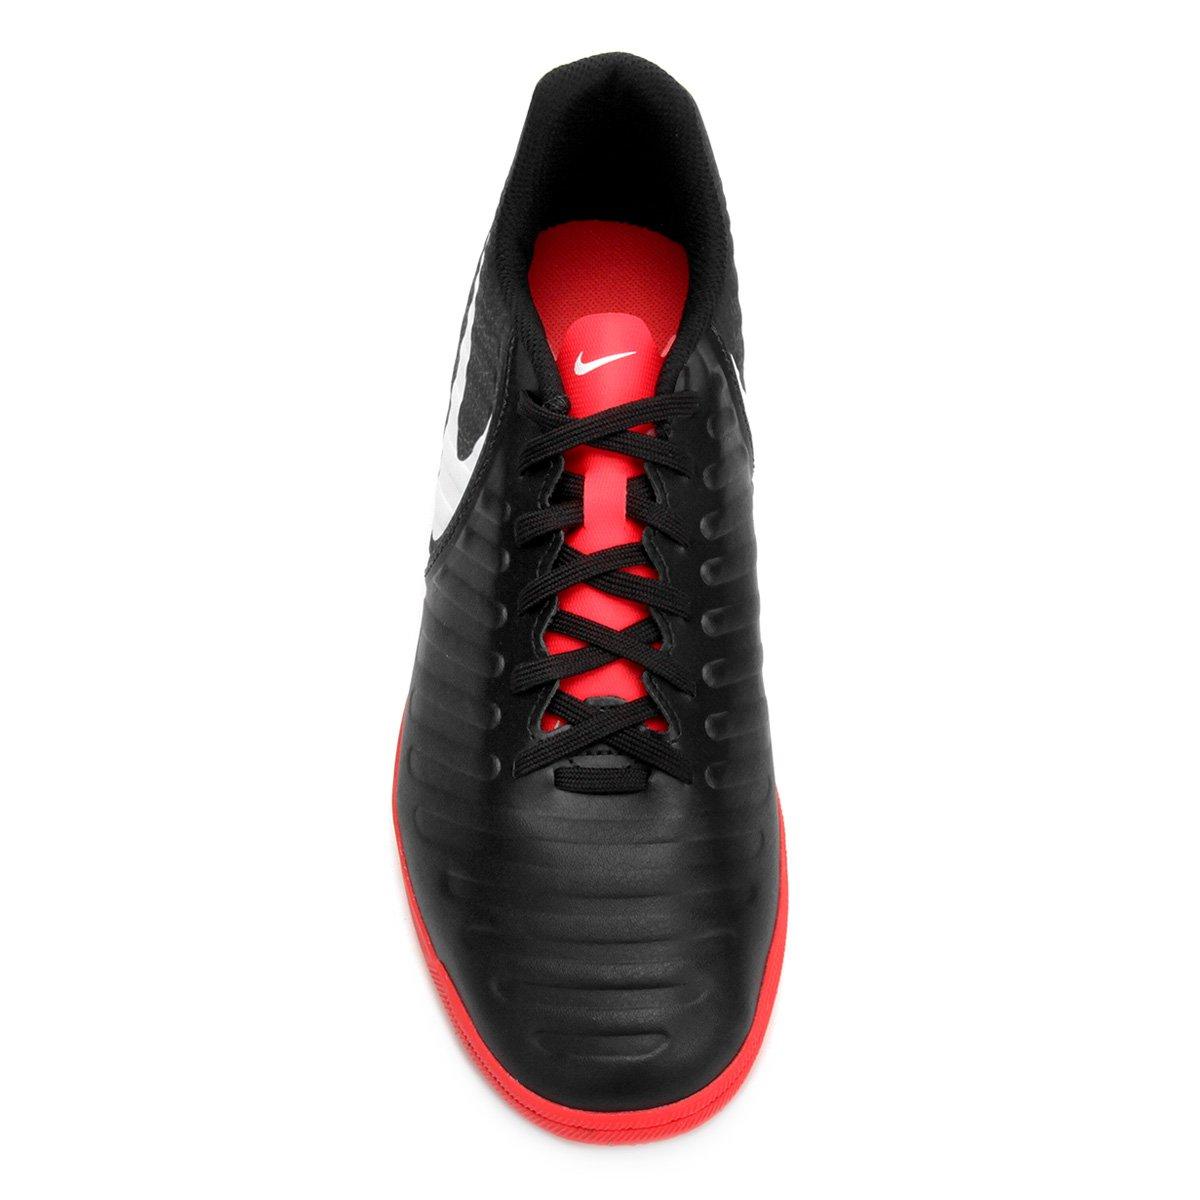 191cd5911e Chuteira Futsal Nike Tiempo Legend 7 Club IC - Preto e Vermelho ...